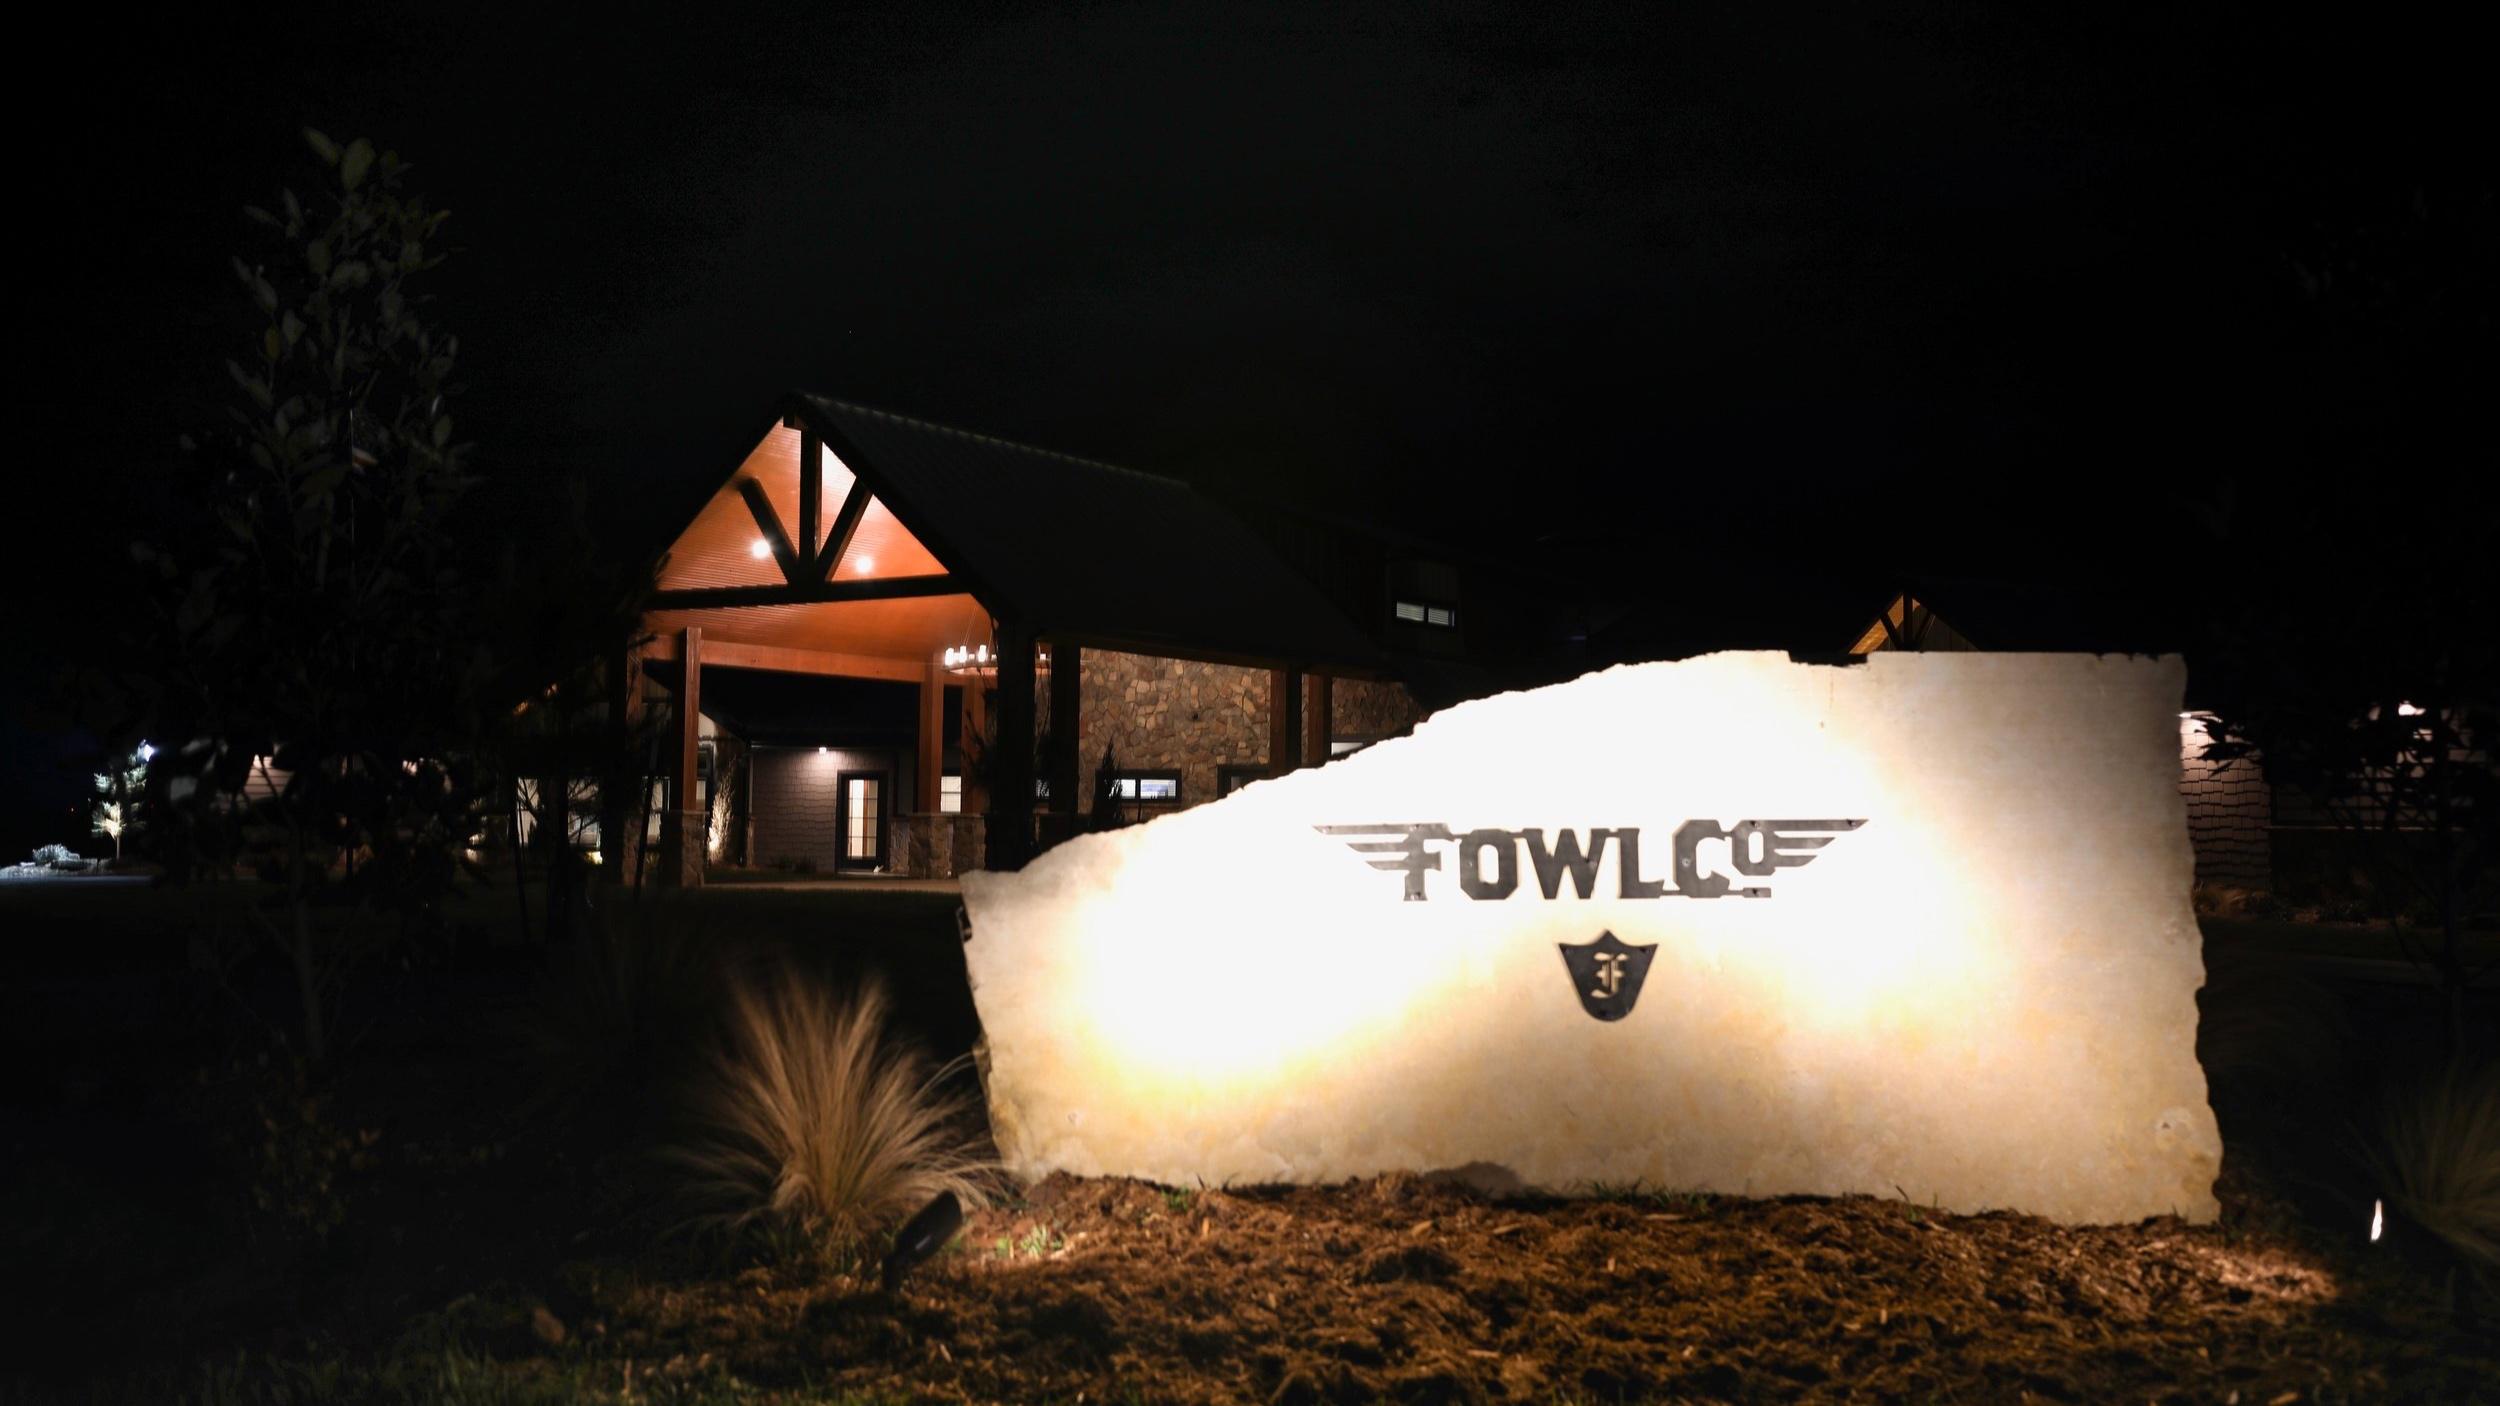 Josh Teff and John David Blagg - FowlCo Outfitters